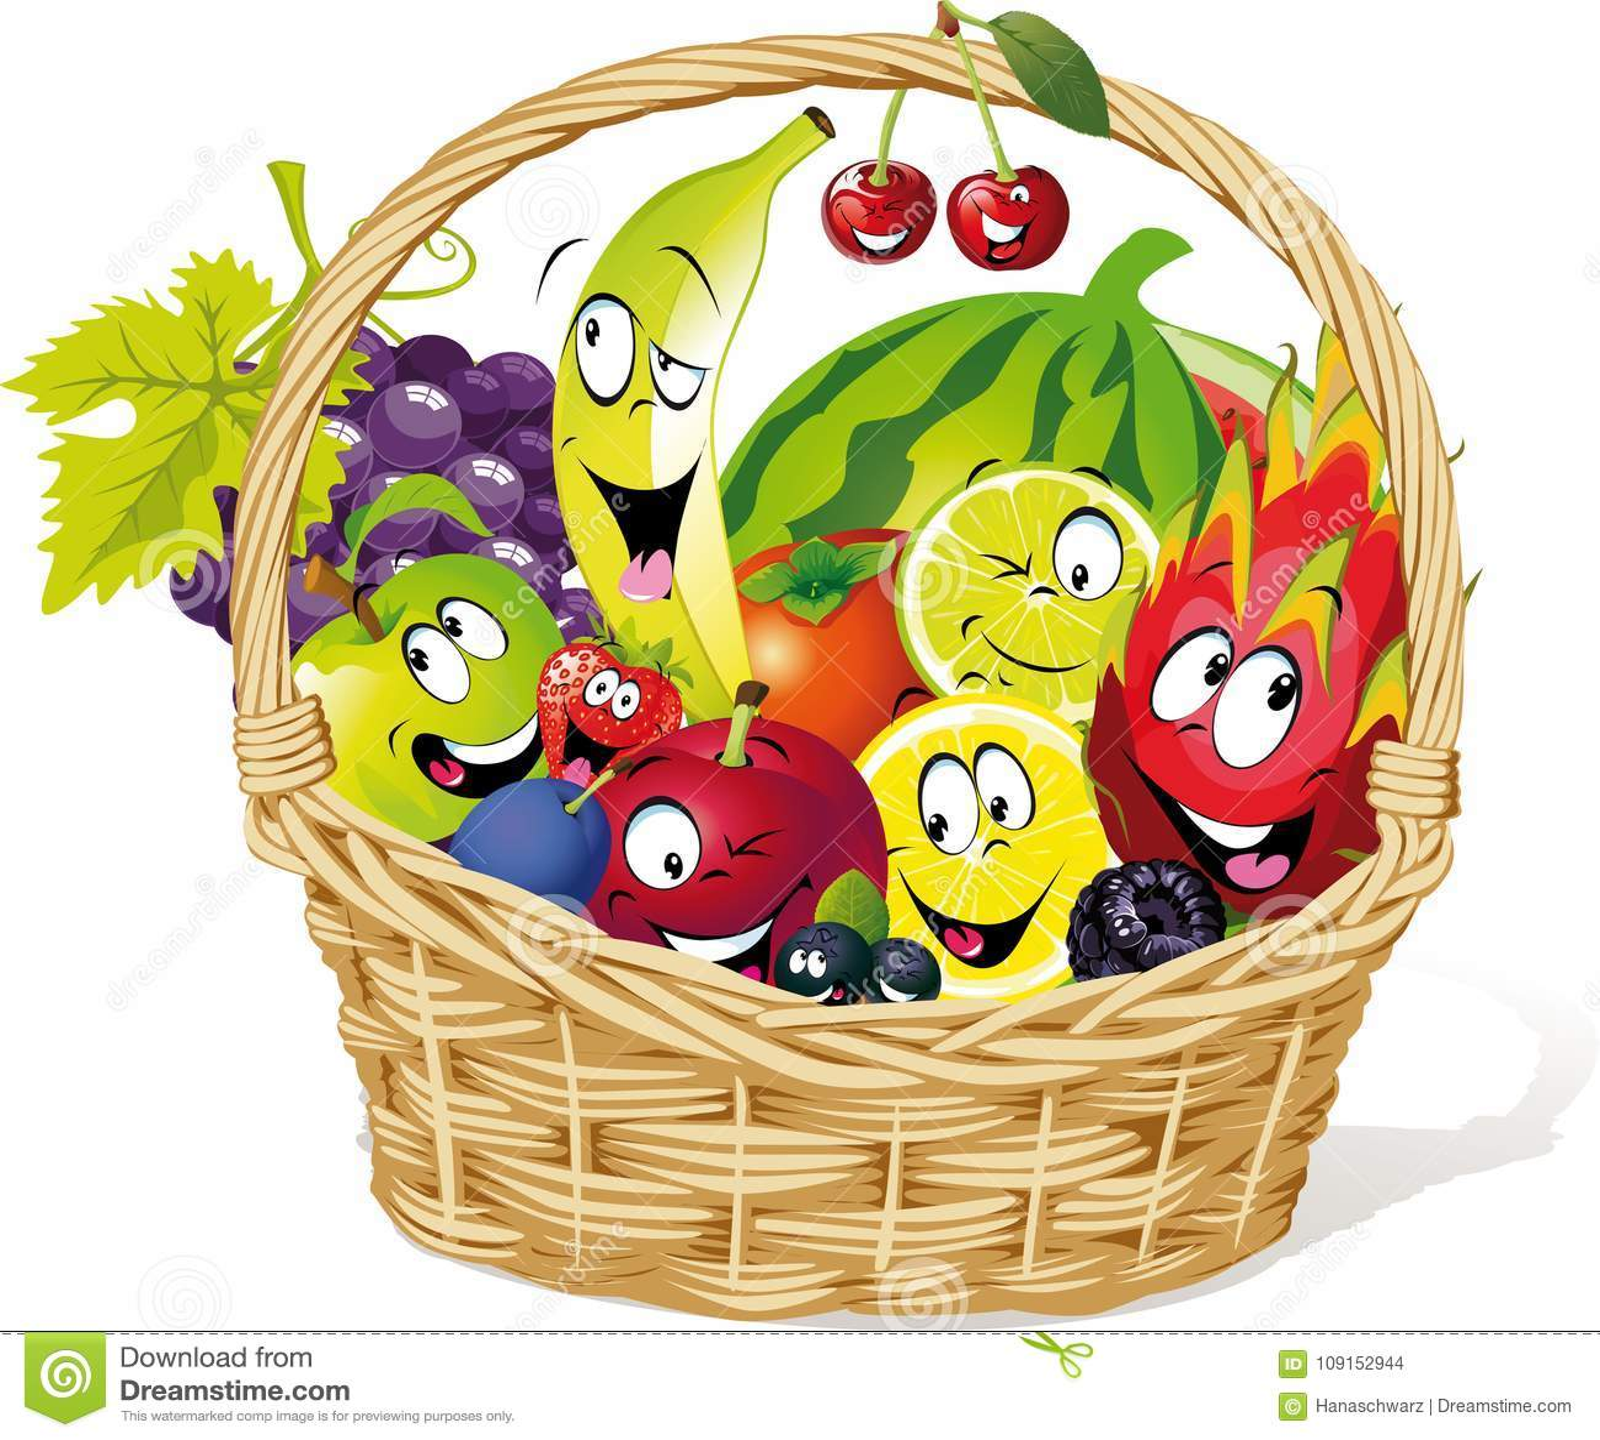 Basket Full Of Fruit Character Cartoon Vector Illustration Stock